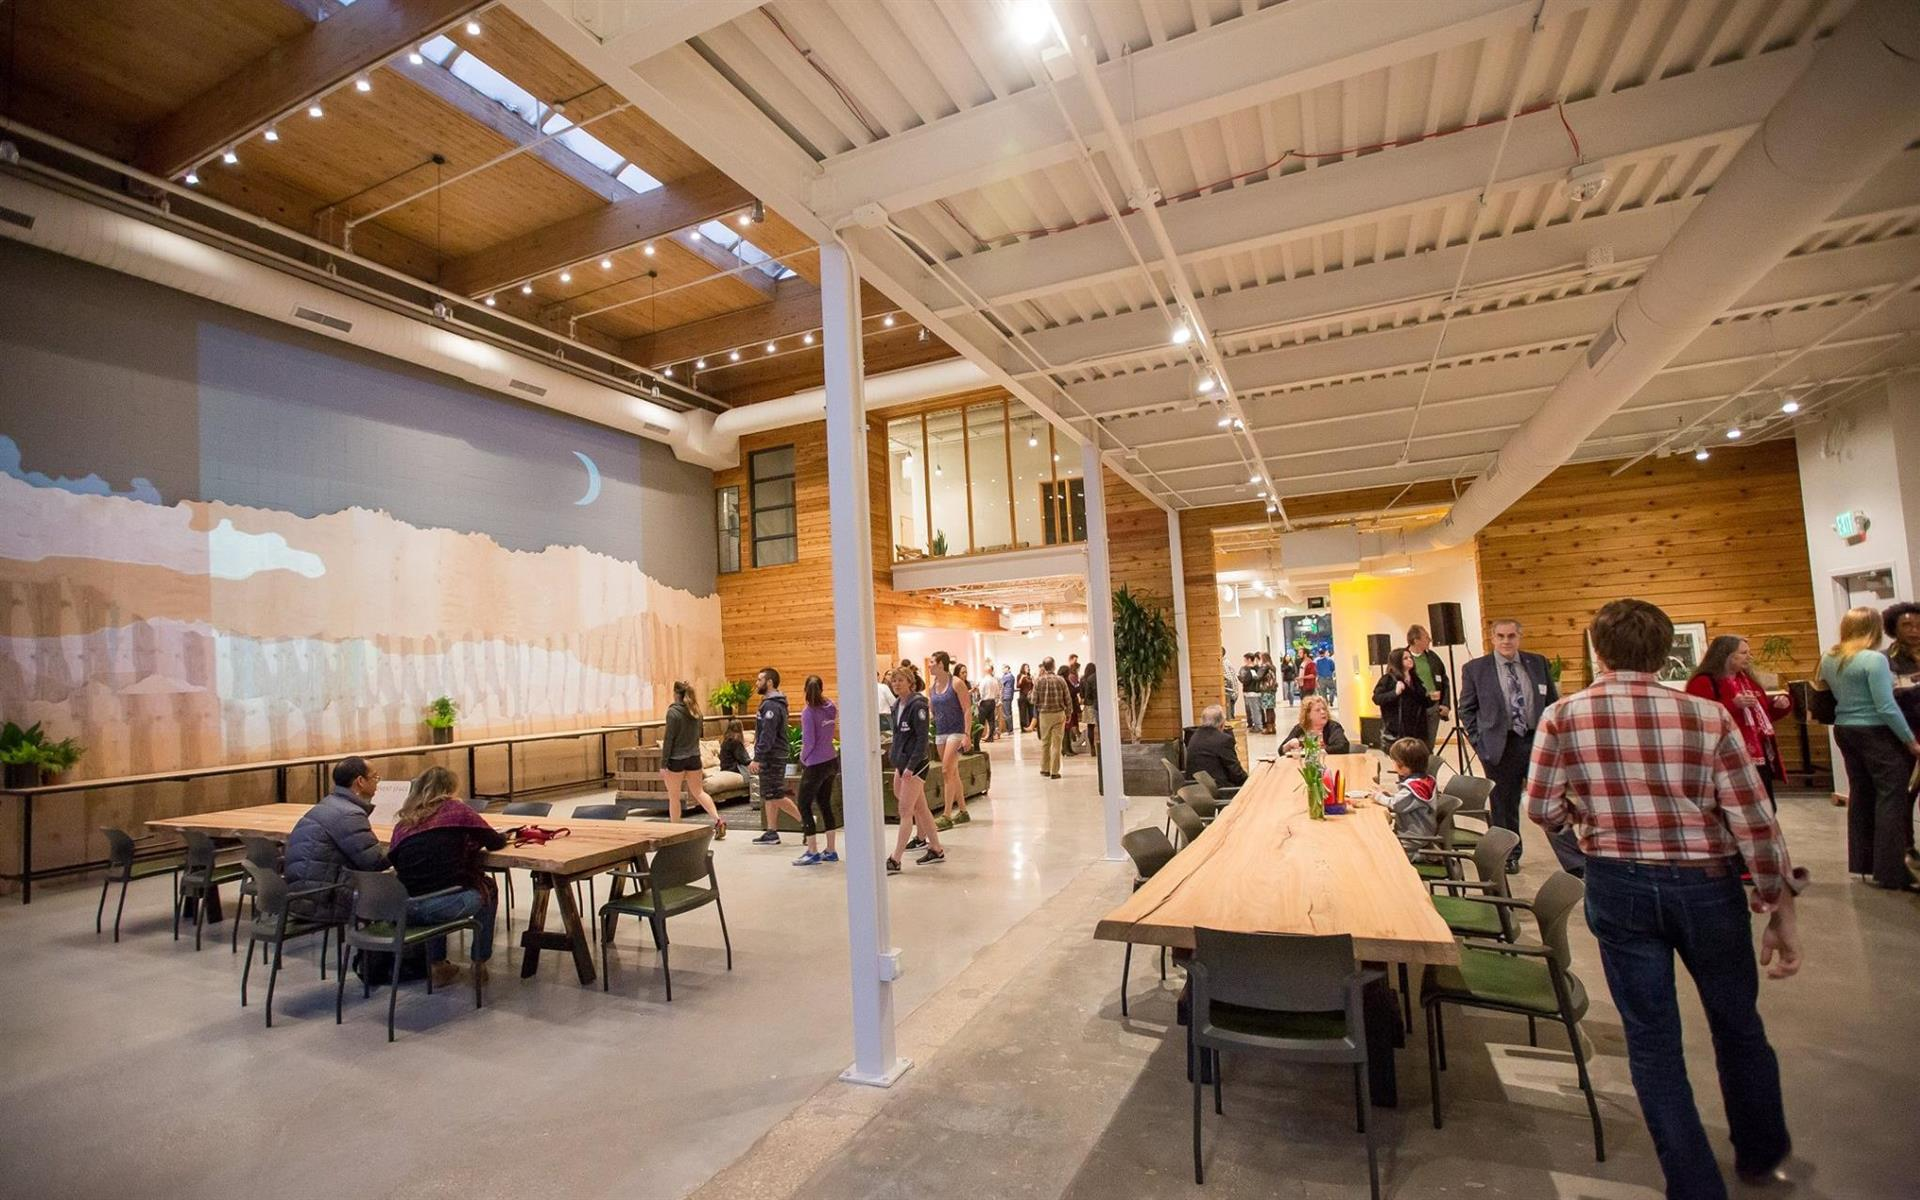 Impact Hub Austin (N. Lamar) - General Co-Working Membership